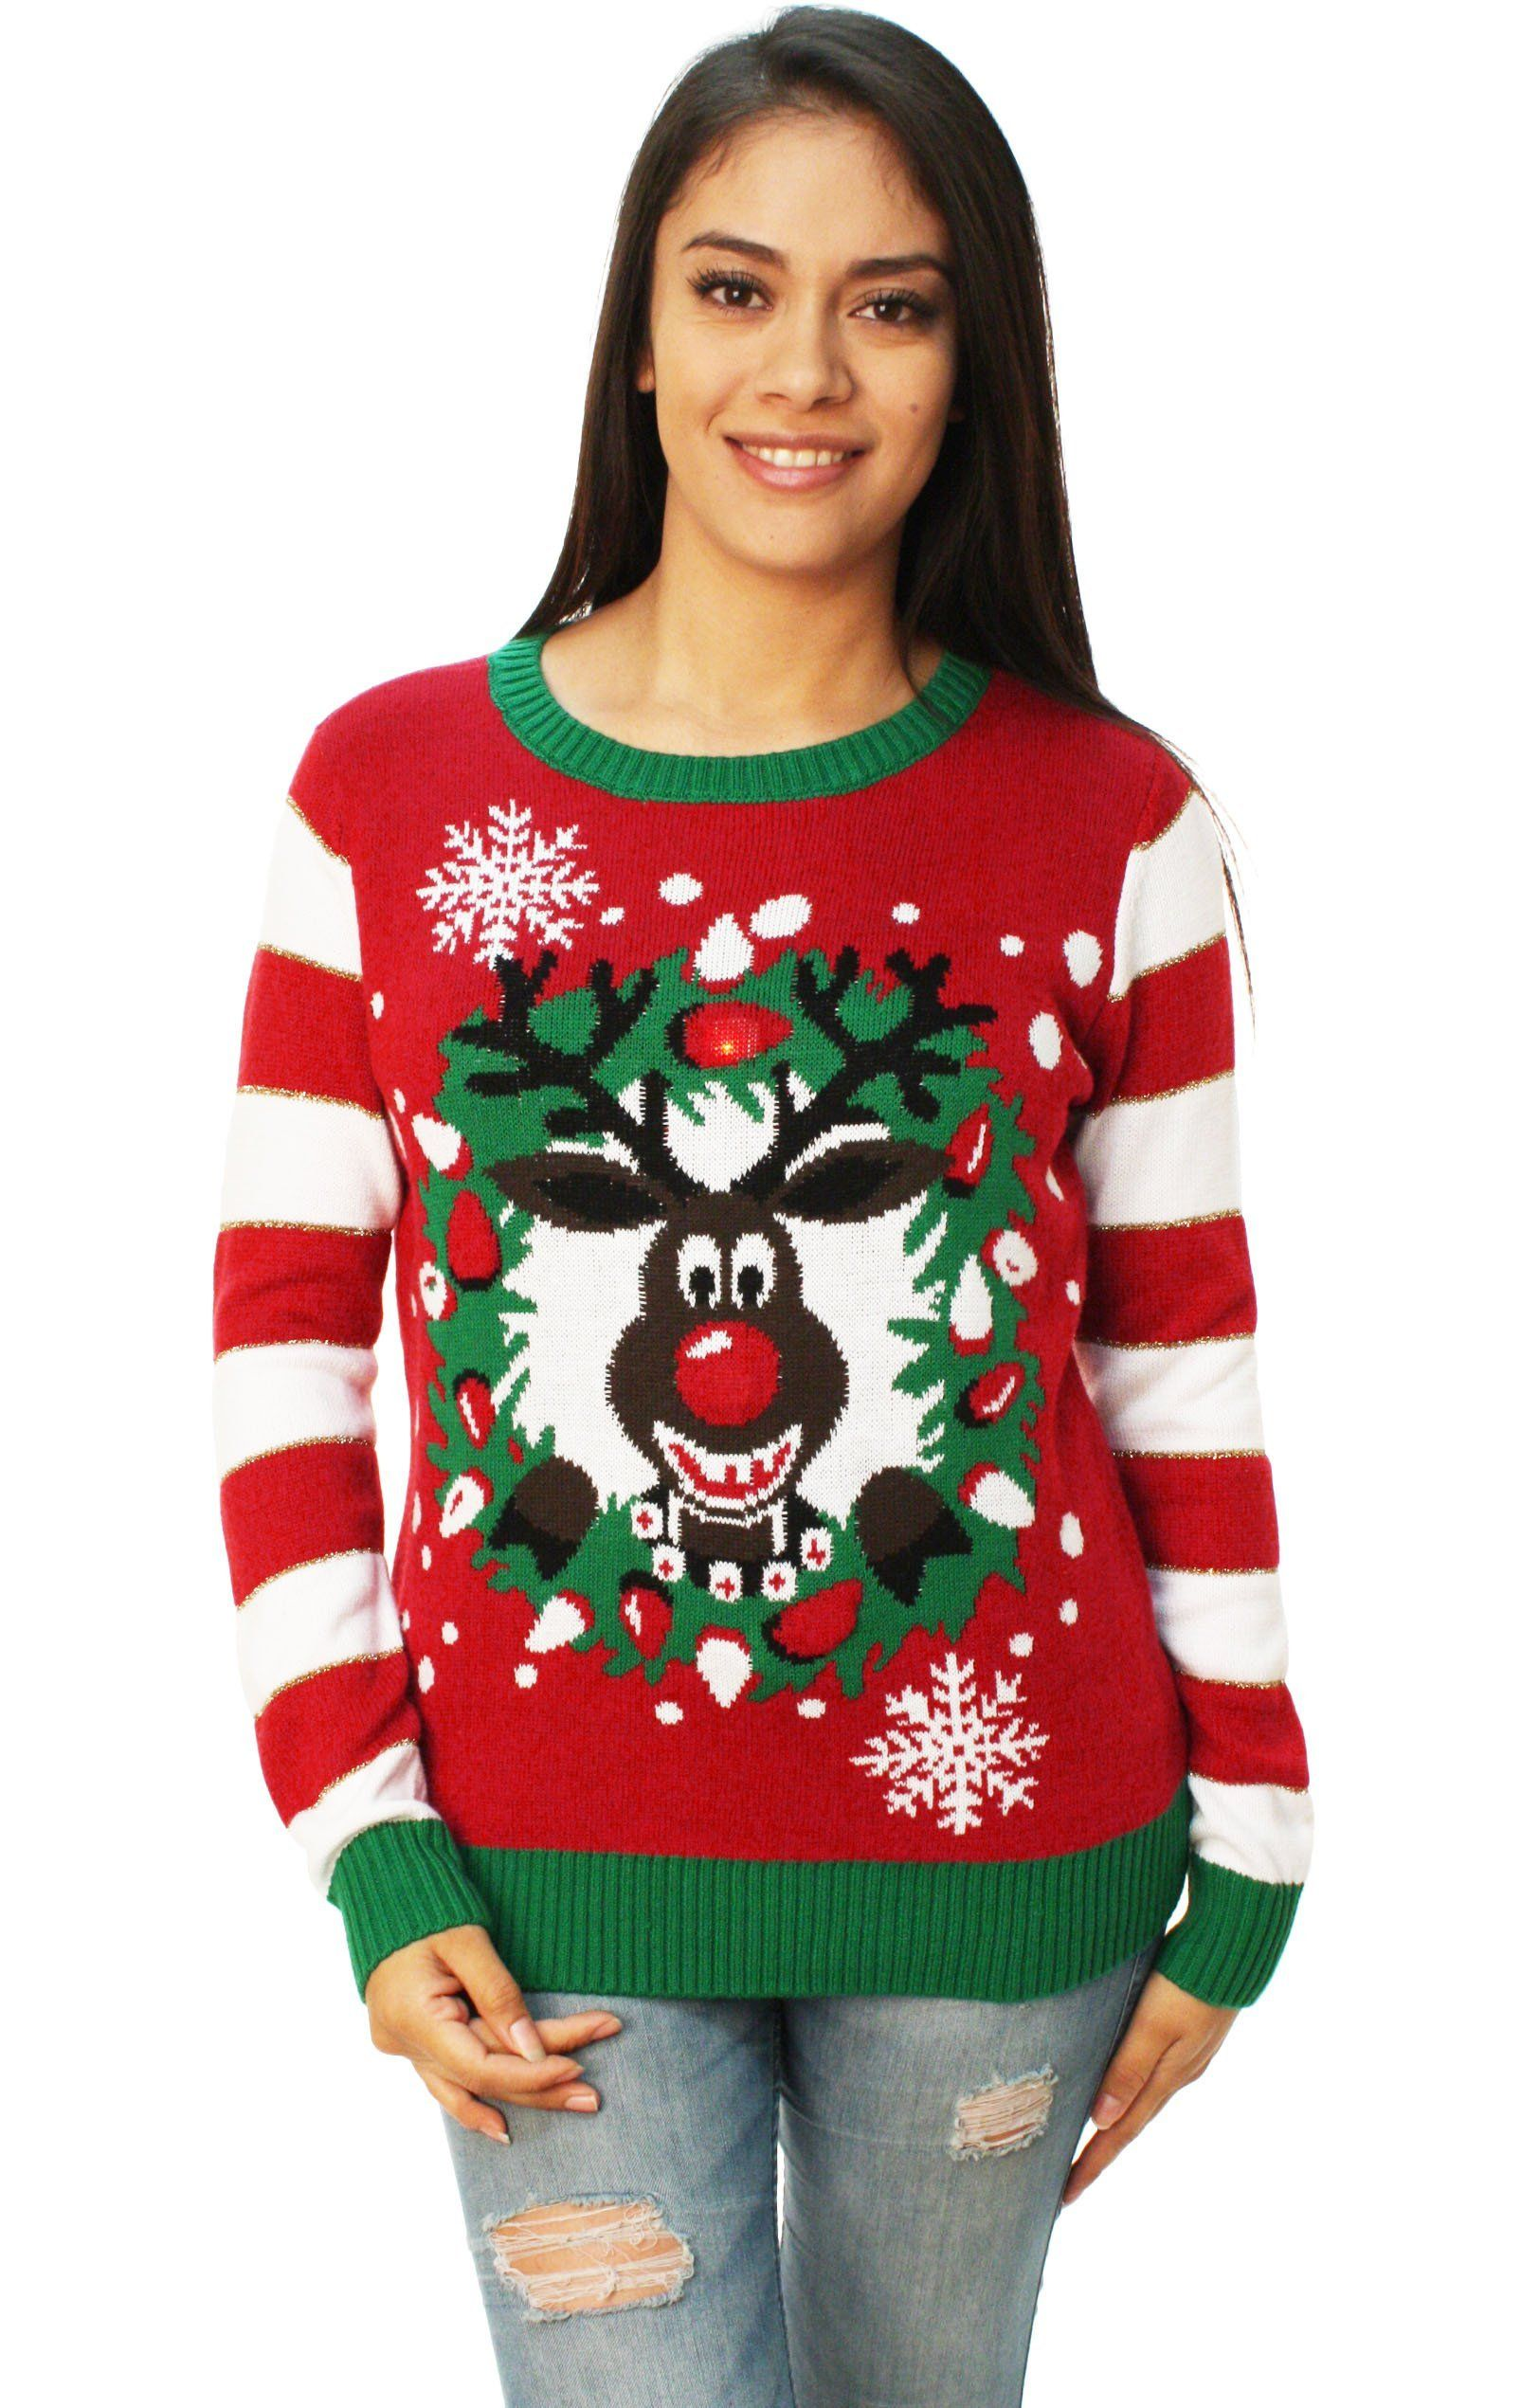 Pin On Tacky Christmas Sweater [ 2541 x 1605 Pixel ]